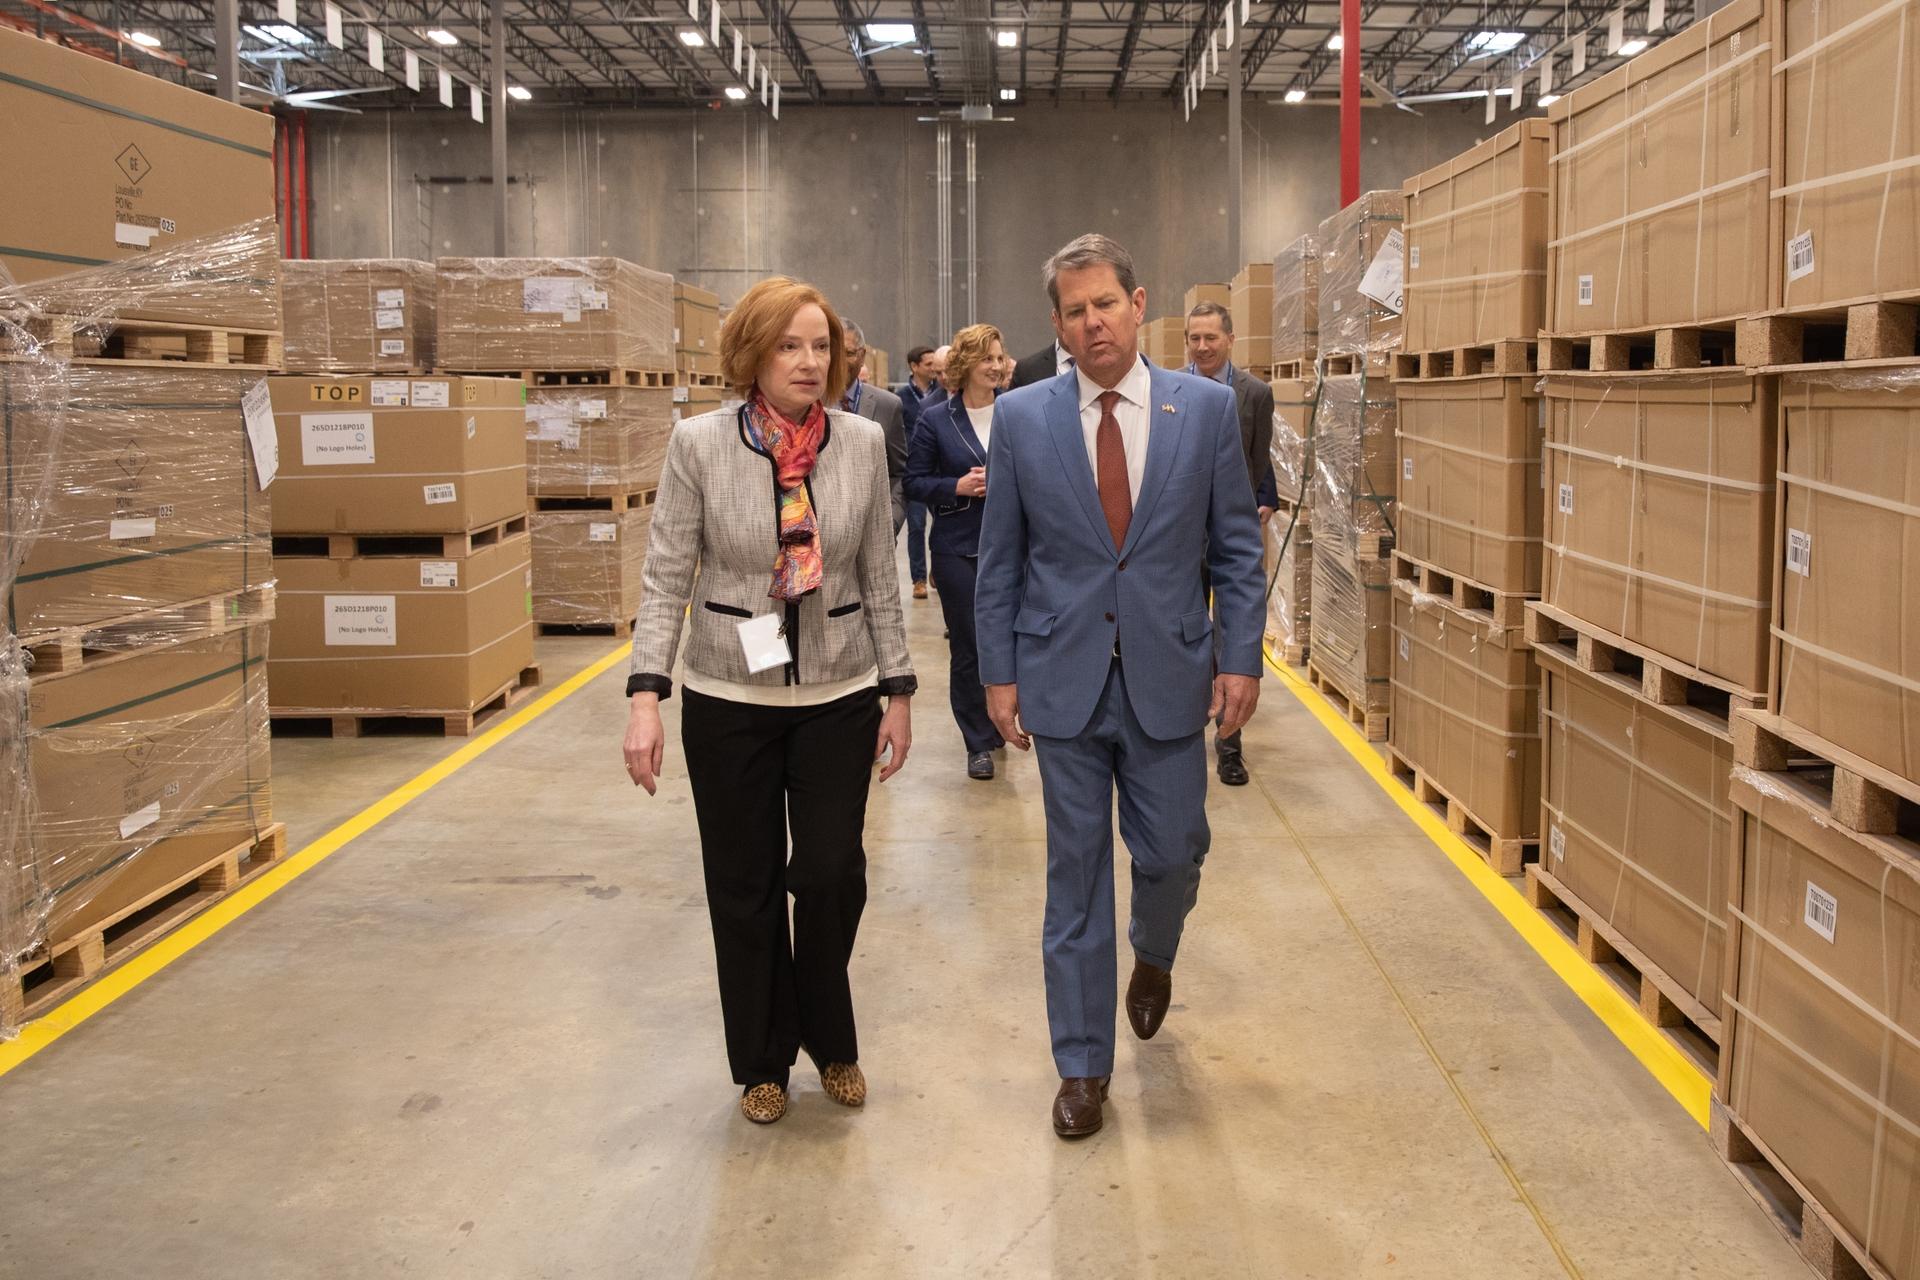 Roper Corp Executive Director Lois Crandell walks GA Gov Kemp through the Southern Logistics Center